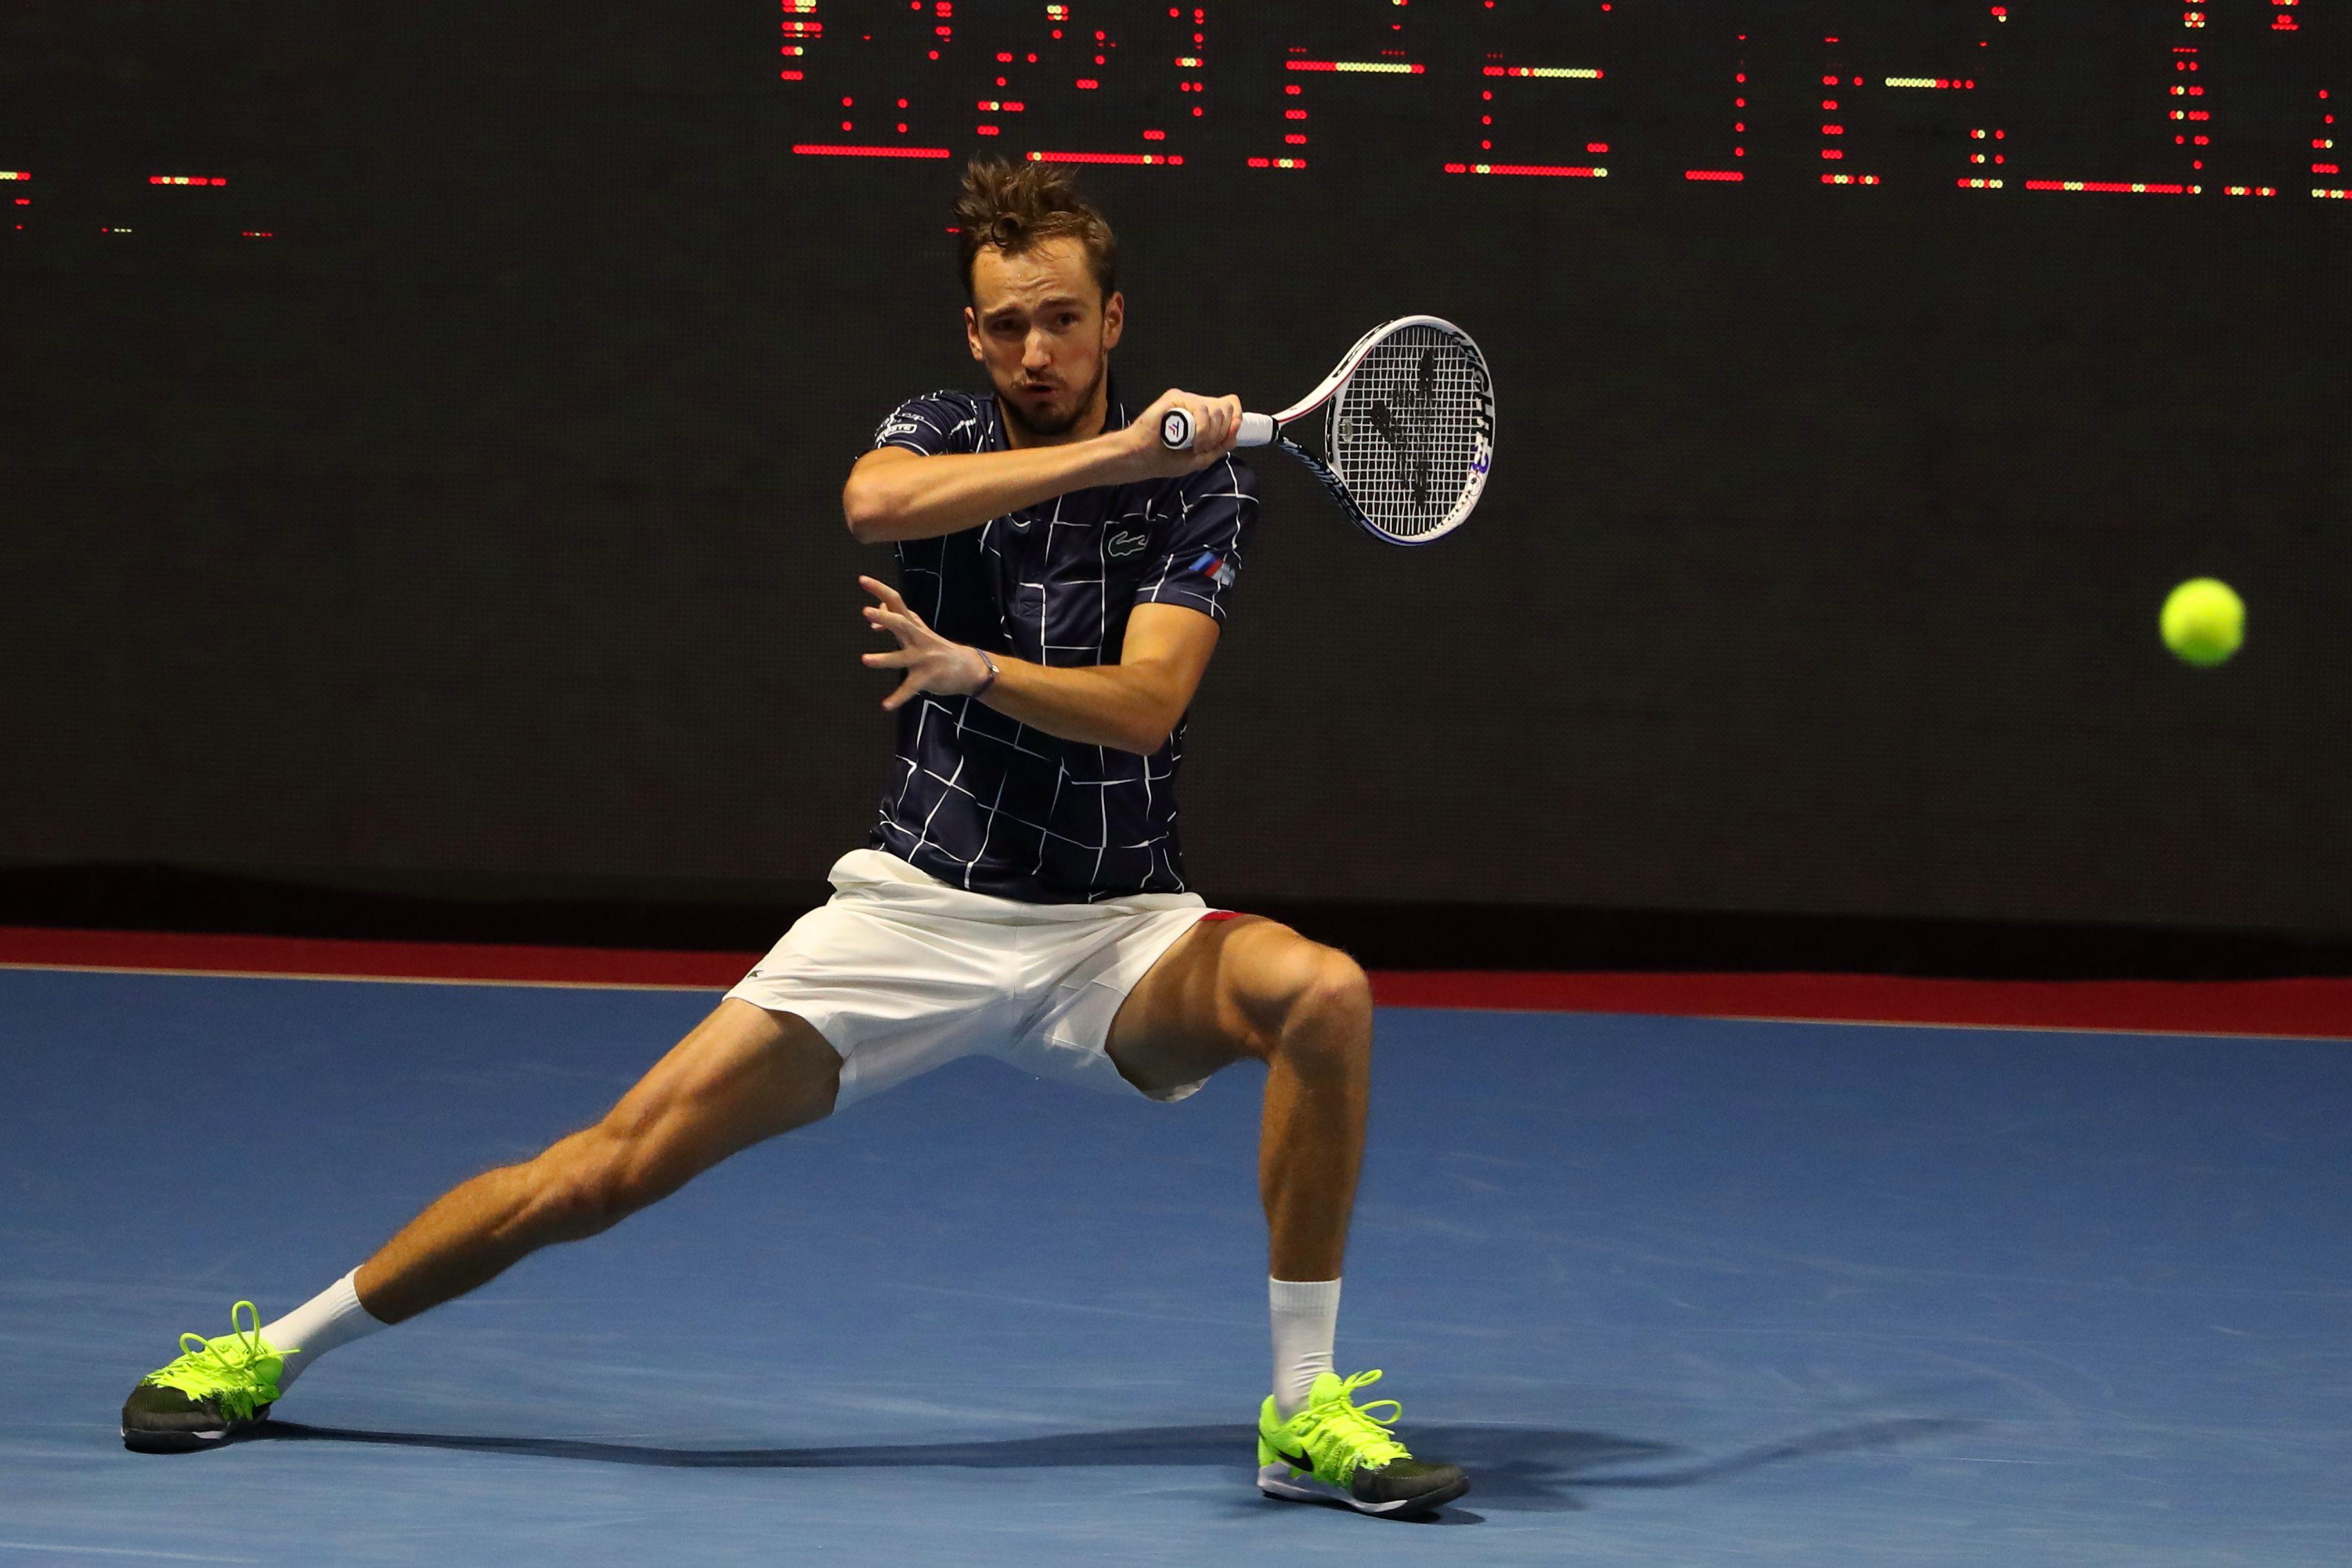 Теннис, Australian Open, третий круг, Медведев - Краинович, прямая текстовая онлайн трансляция